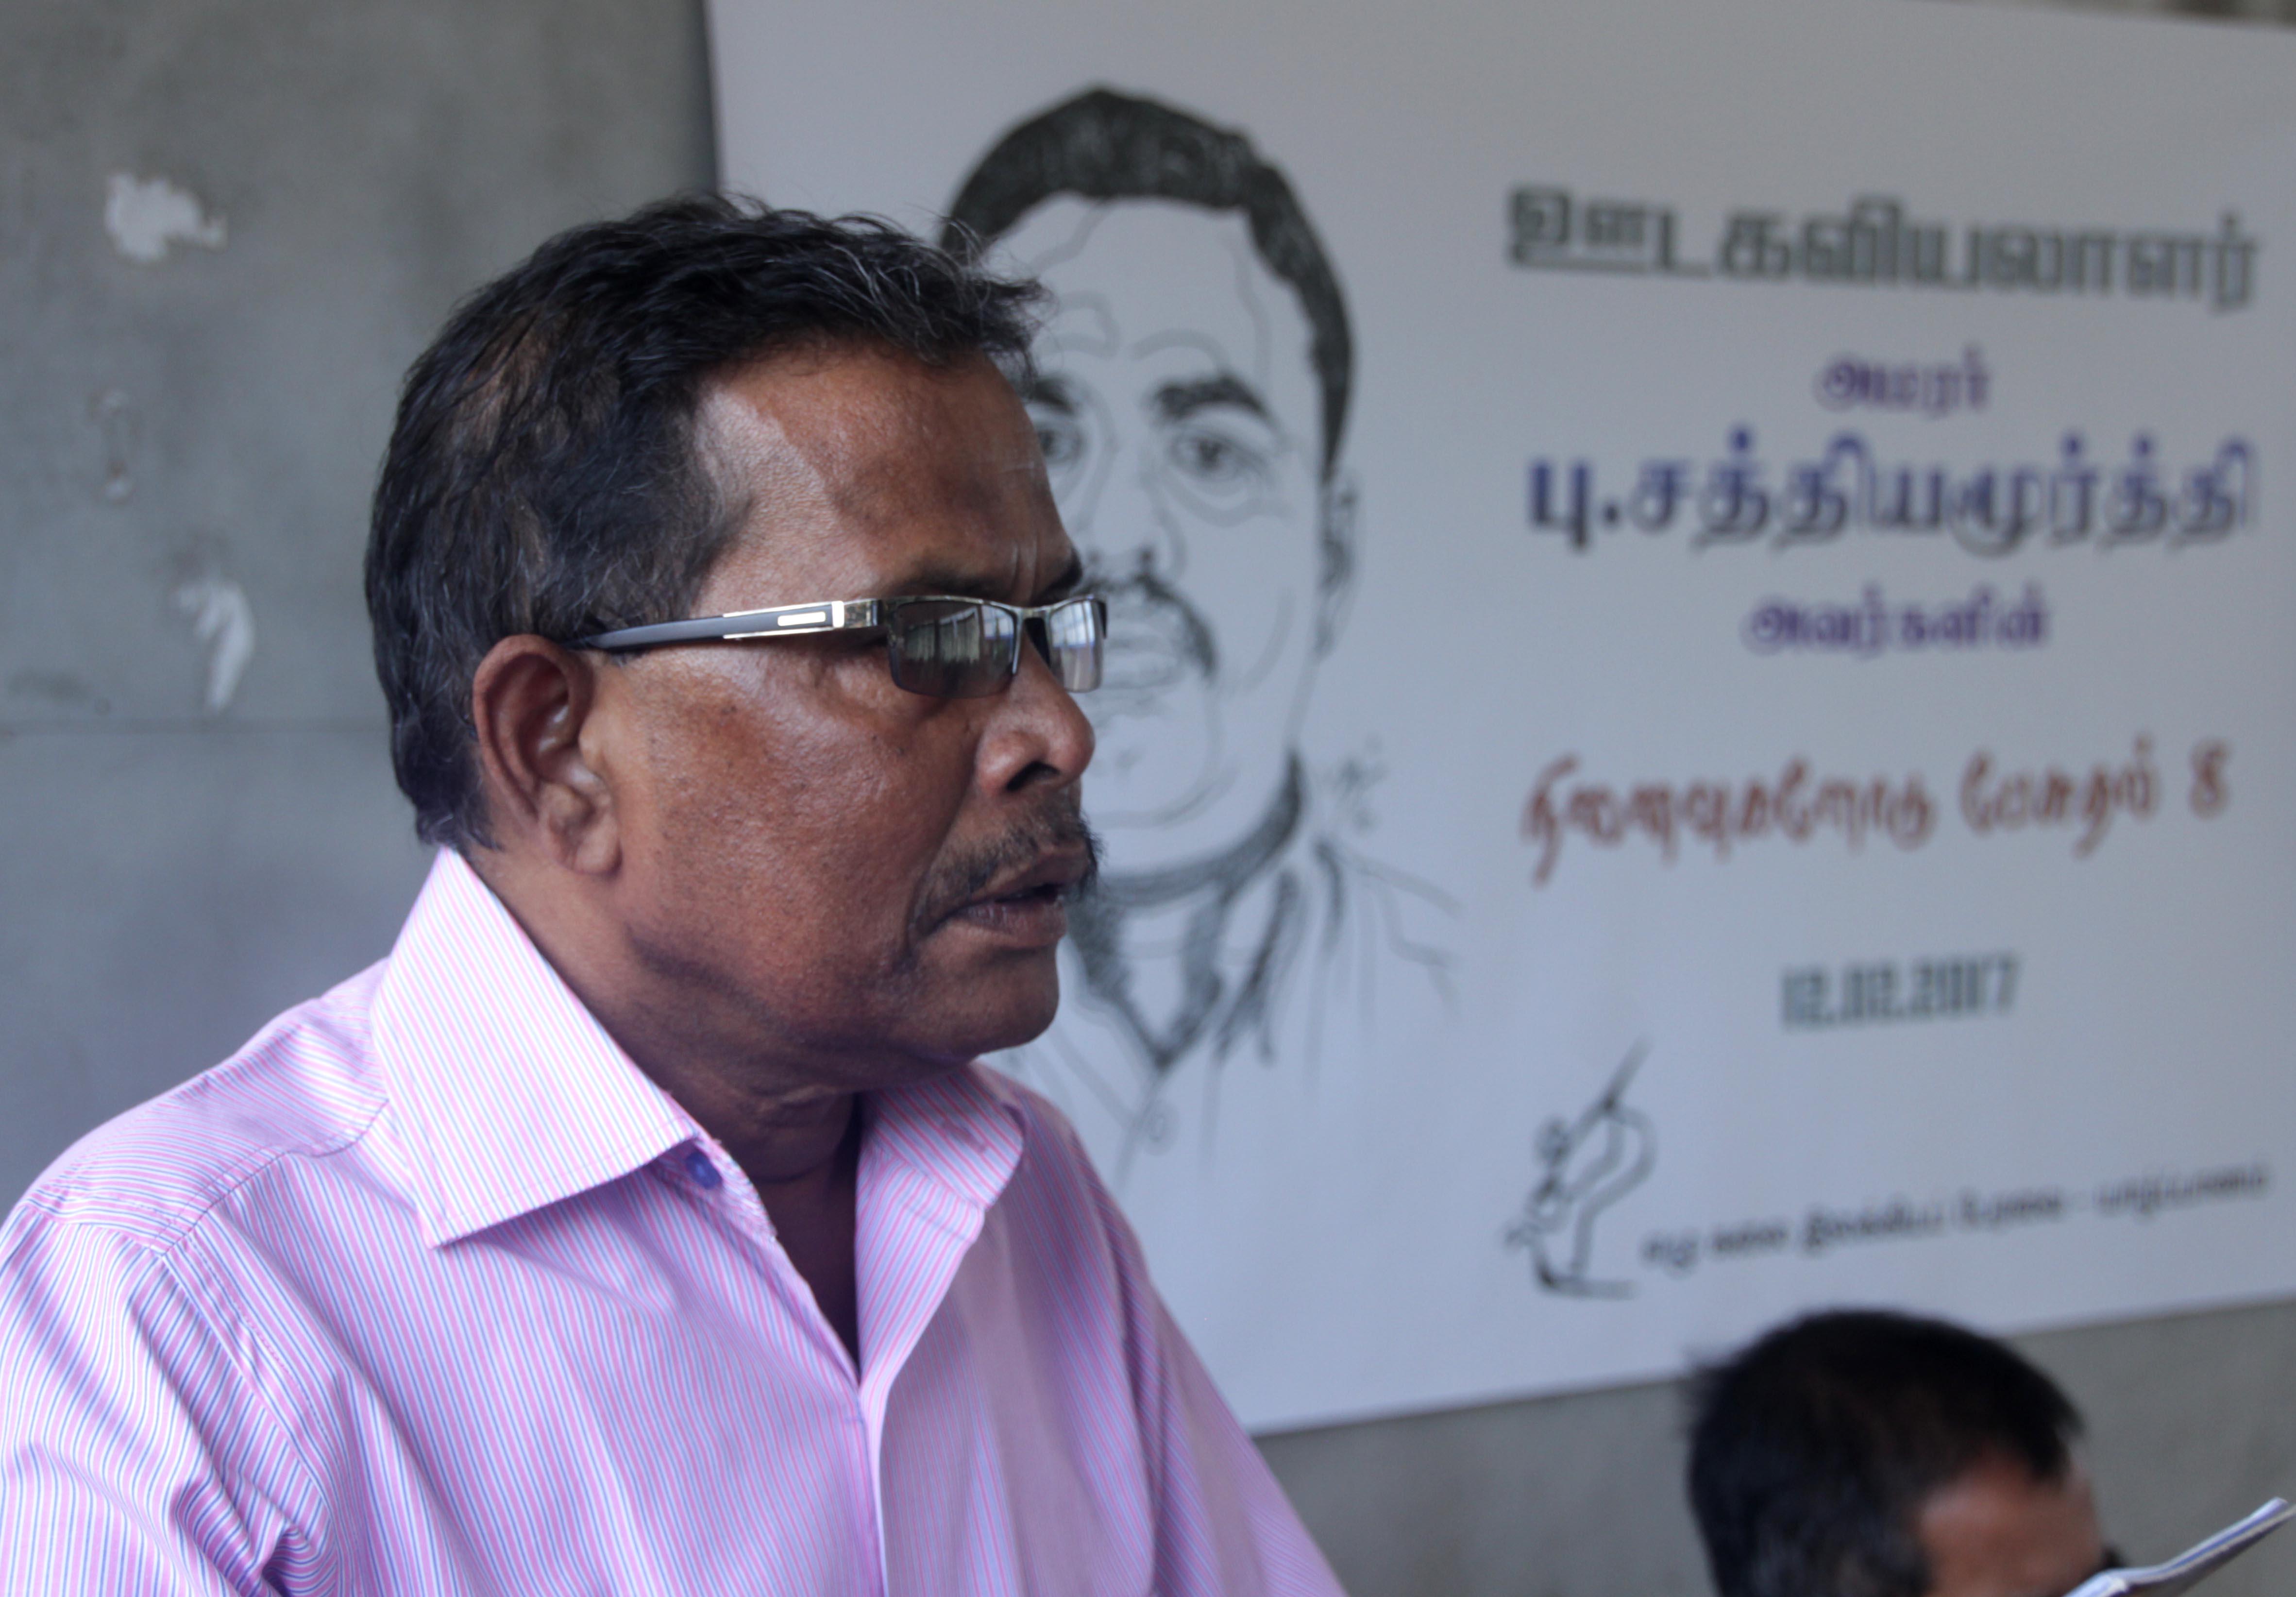 Journalist Sathiyamoorthy (2)